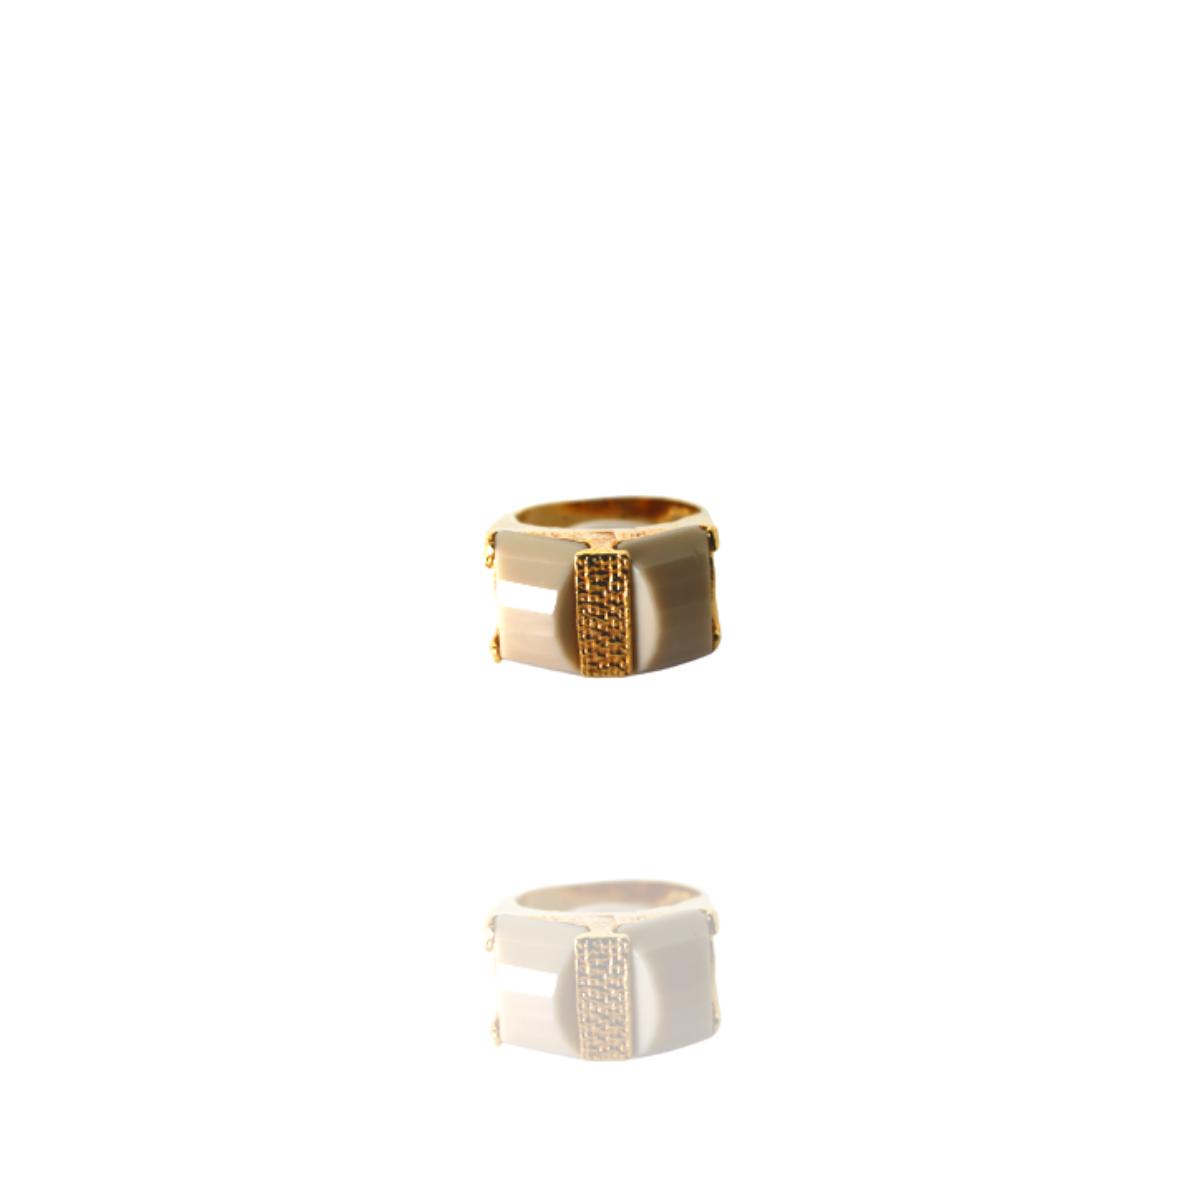 Anel Barbara Strauss Semi Joia Agra Em Resina Lalique Bege, Rev. Em Ouro Amarelo 18K